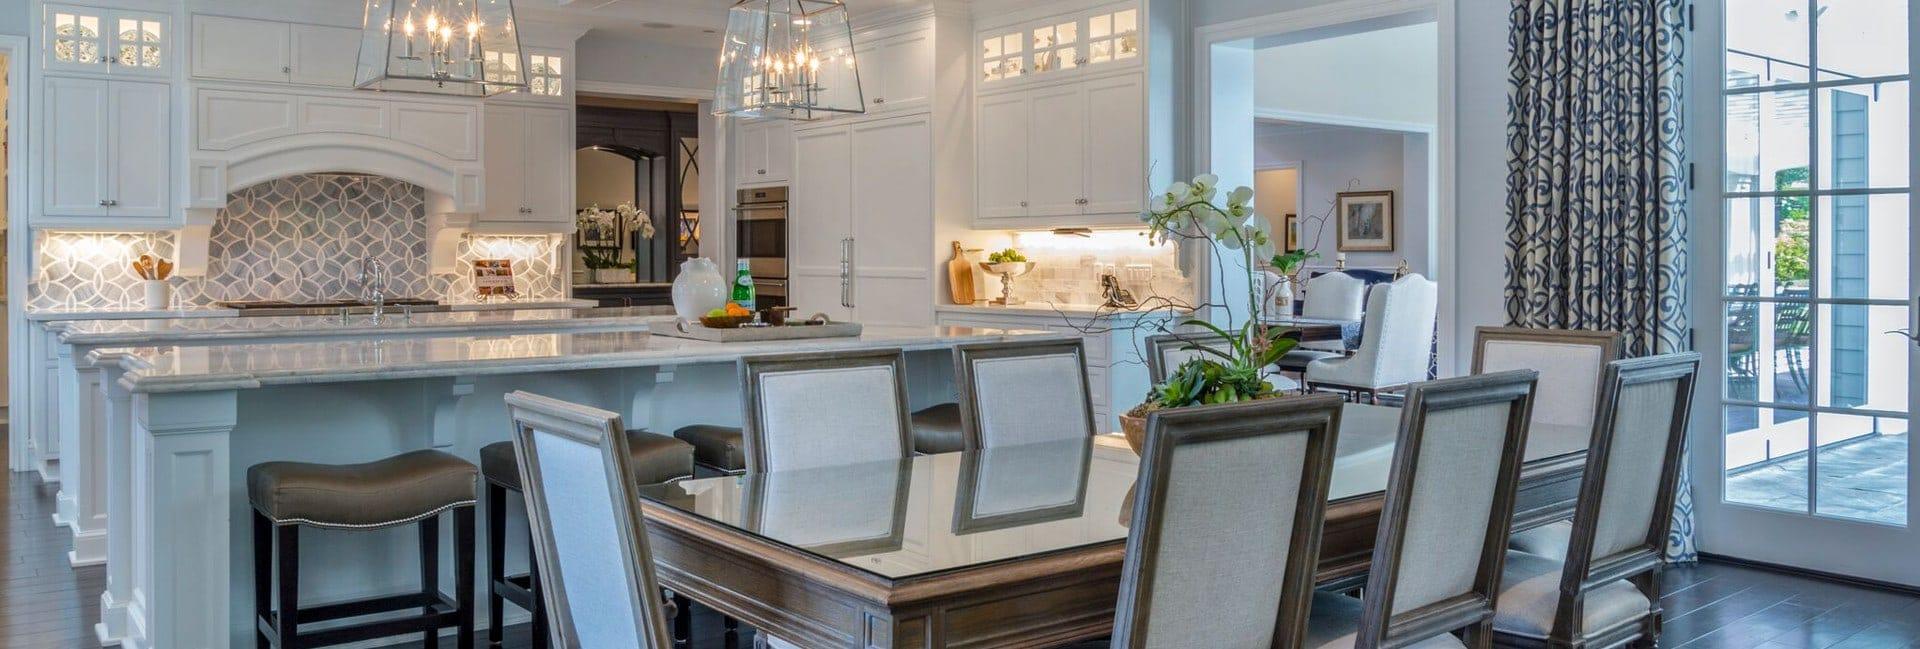 Kitchen interior design of Berkshire house in La Cañada